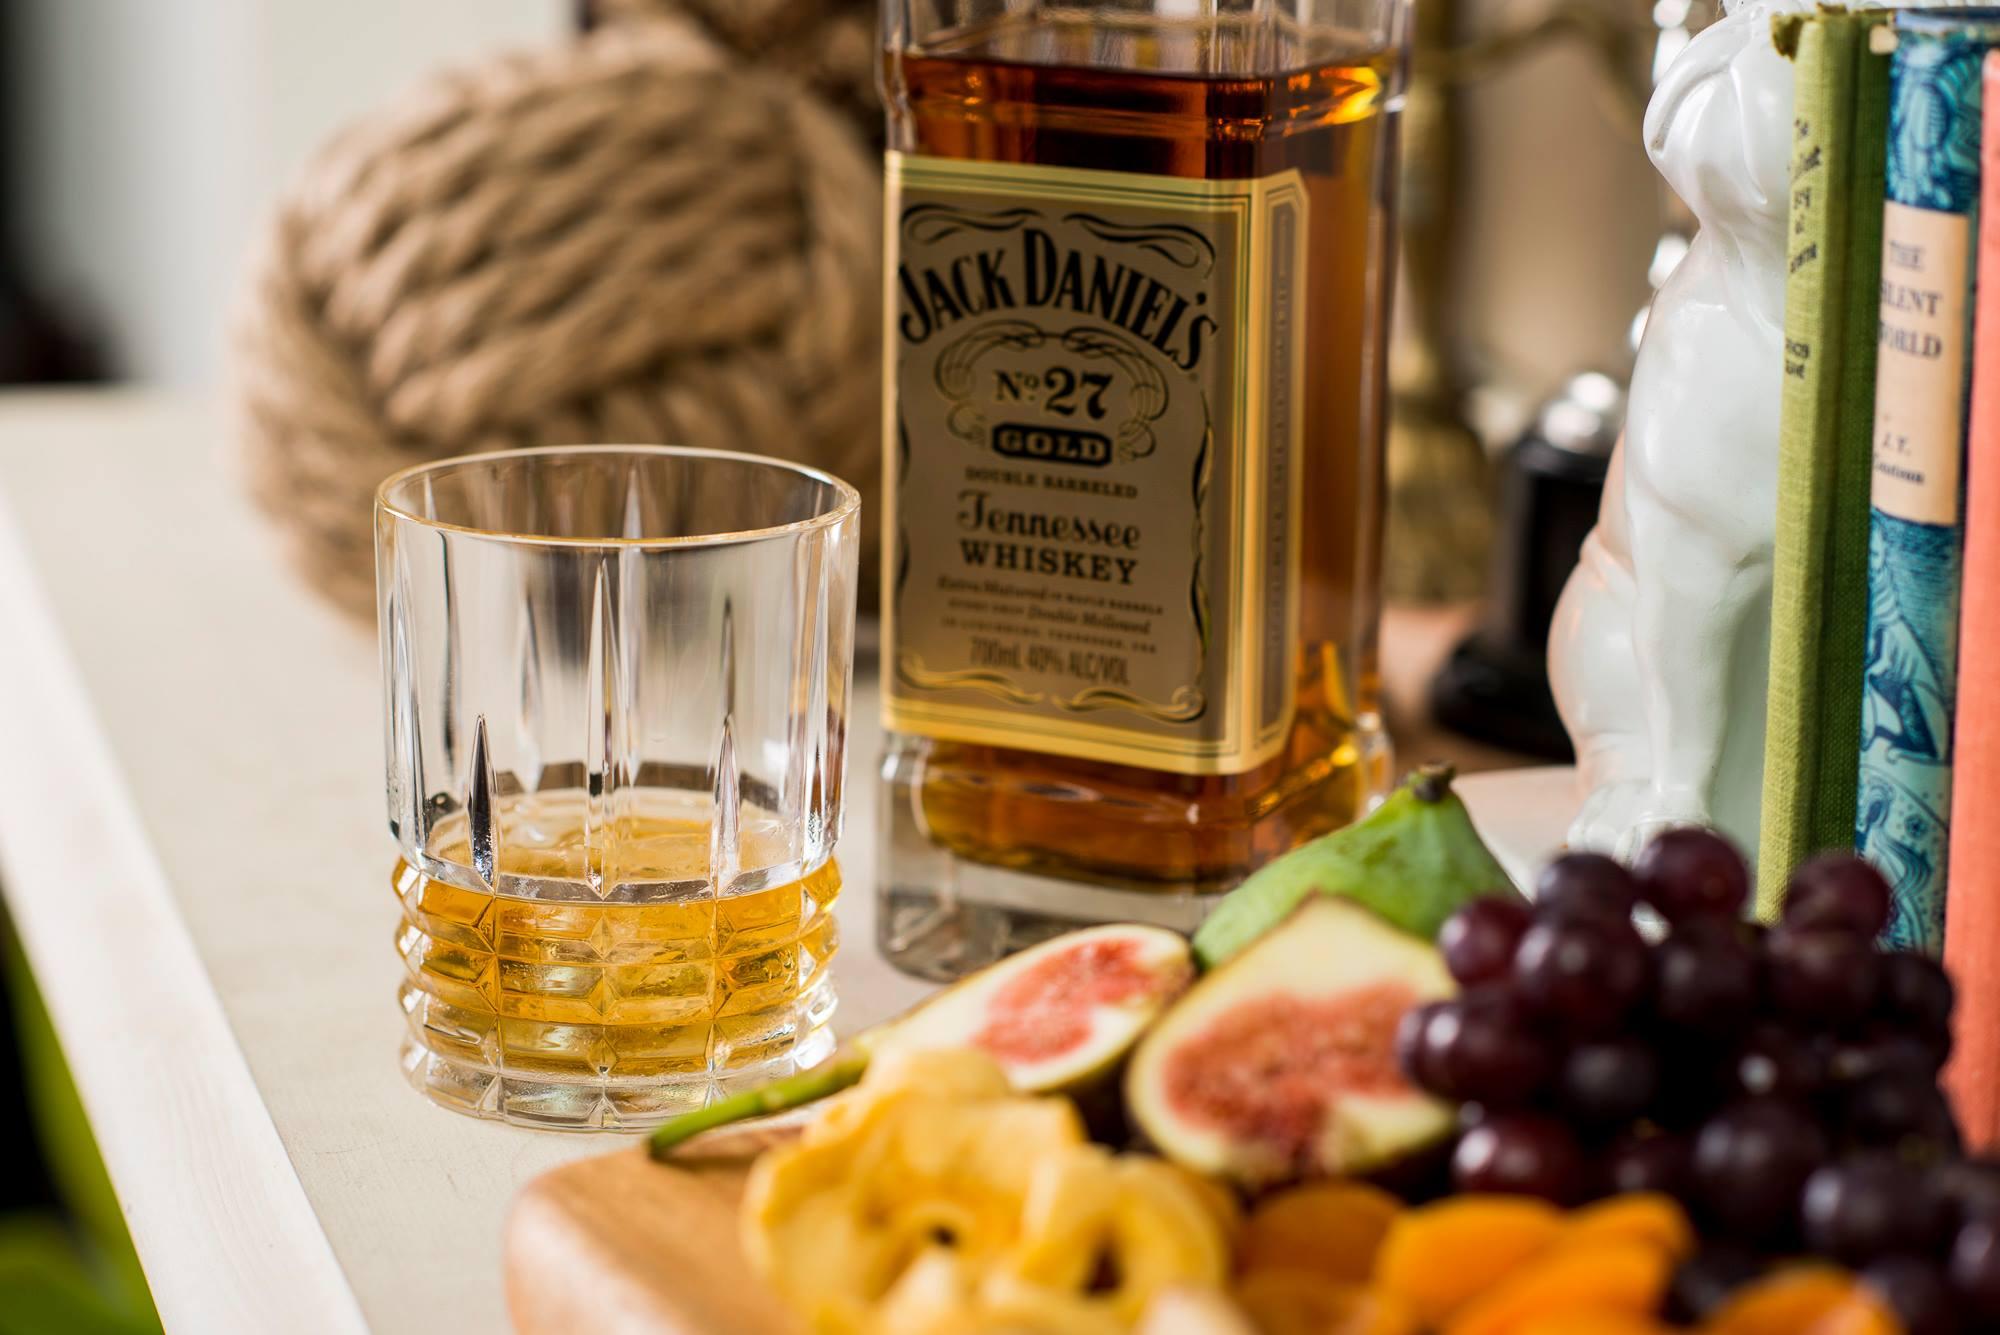 Jack Daniel's pop-up coming to Melbourne